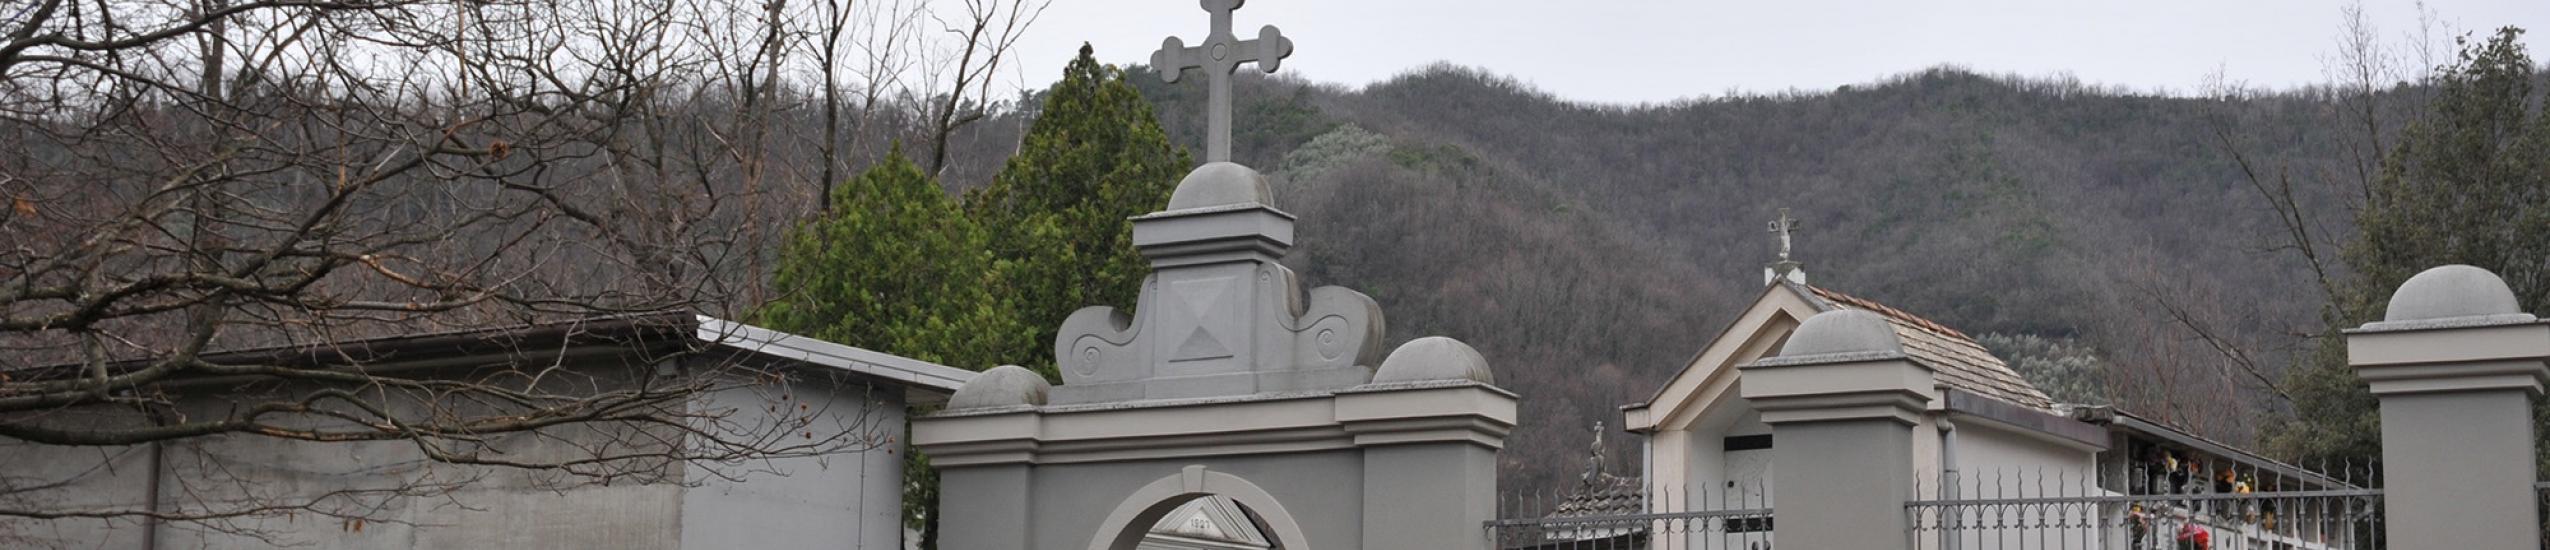 cimitero di Pontori